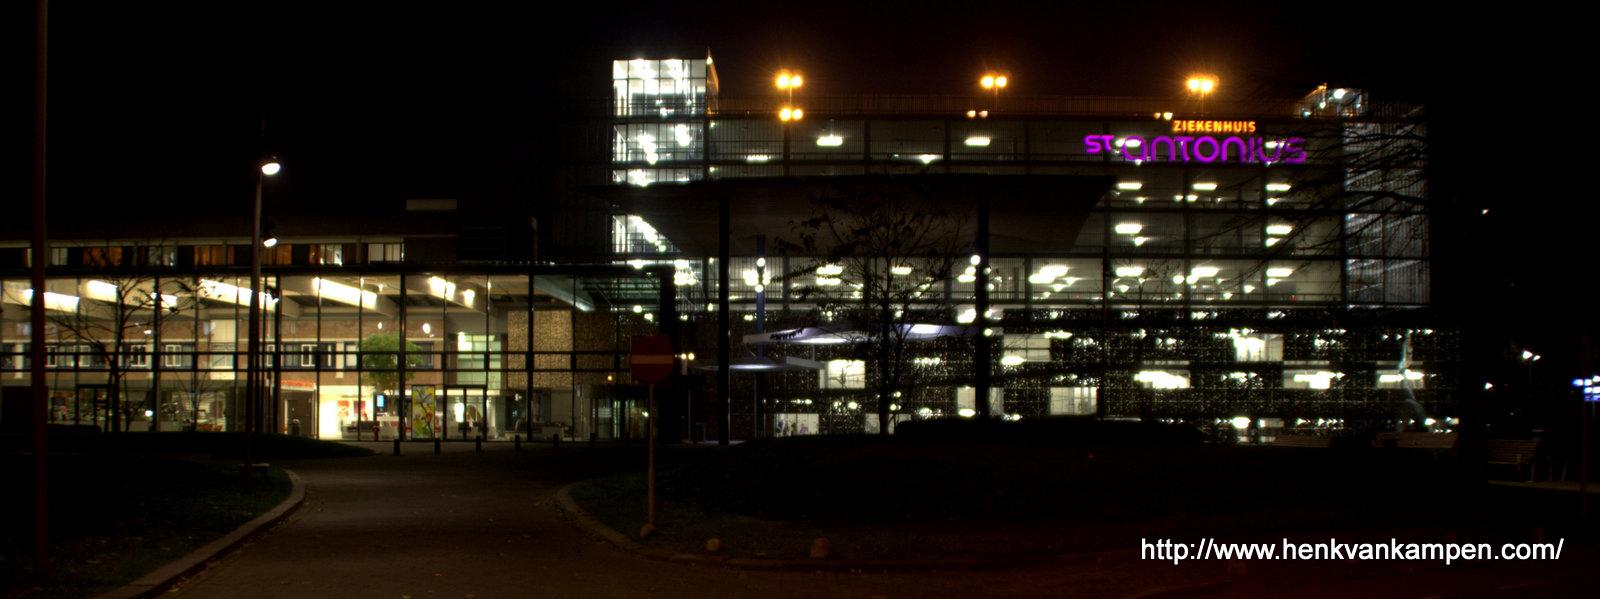 St Antoniusziekenhuis, Nieuwegein